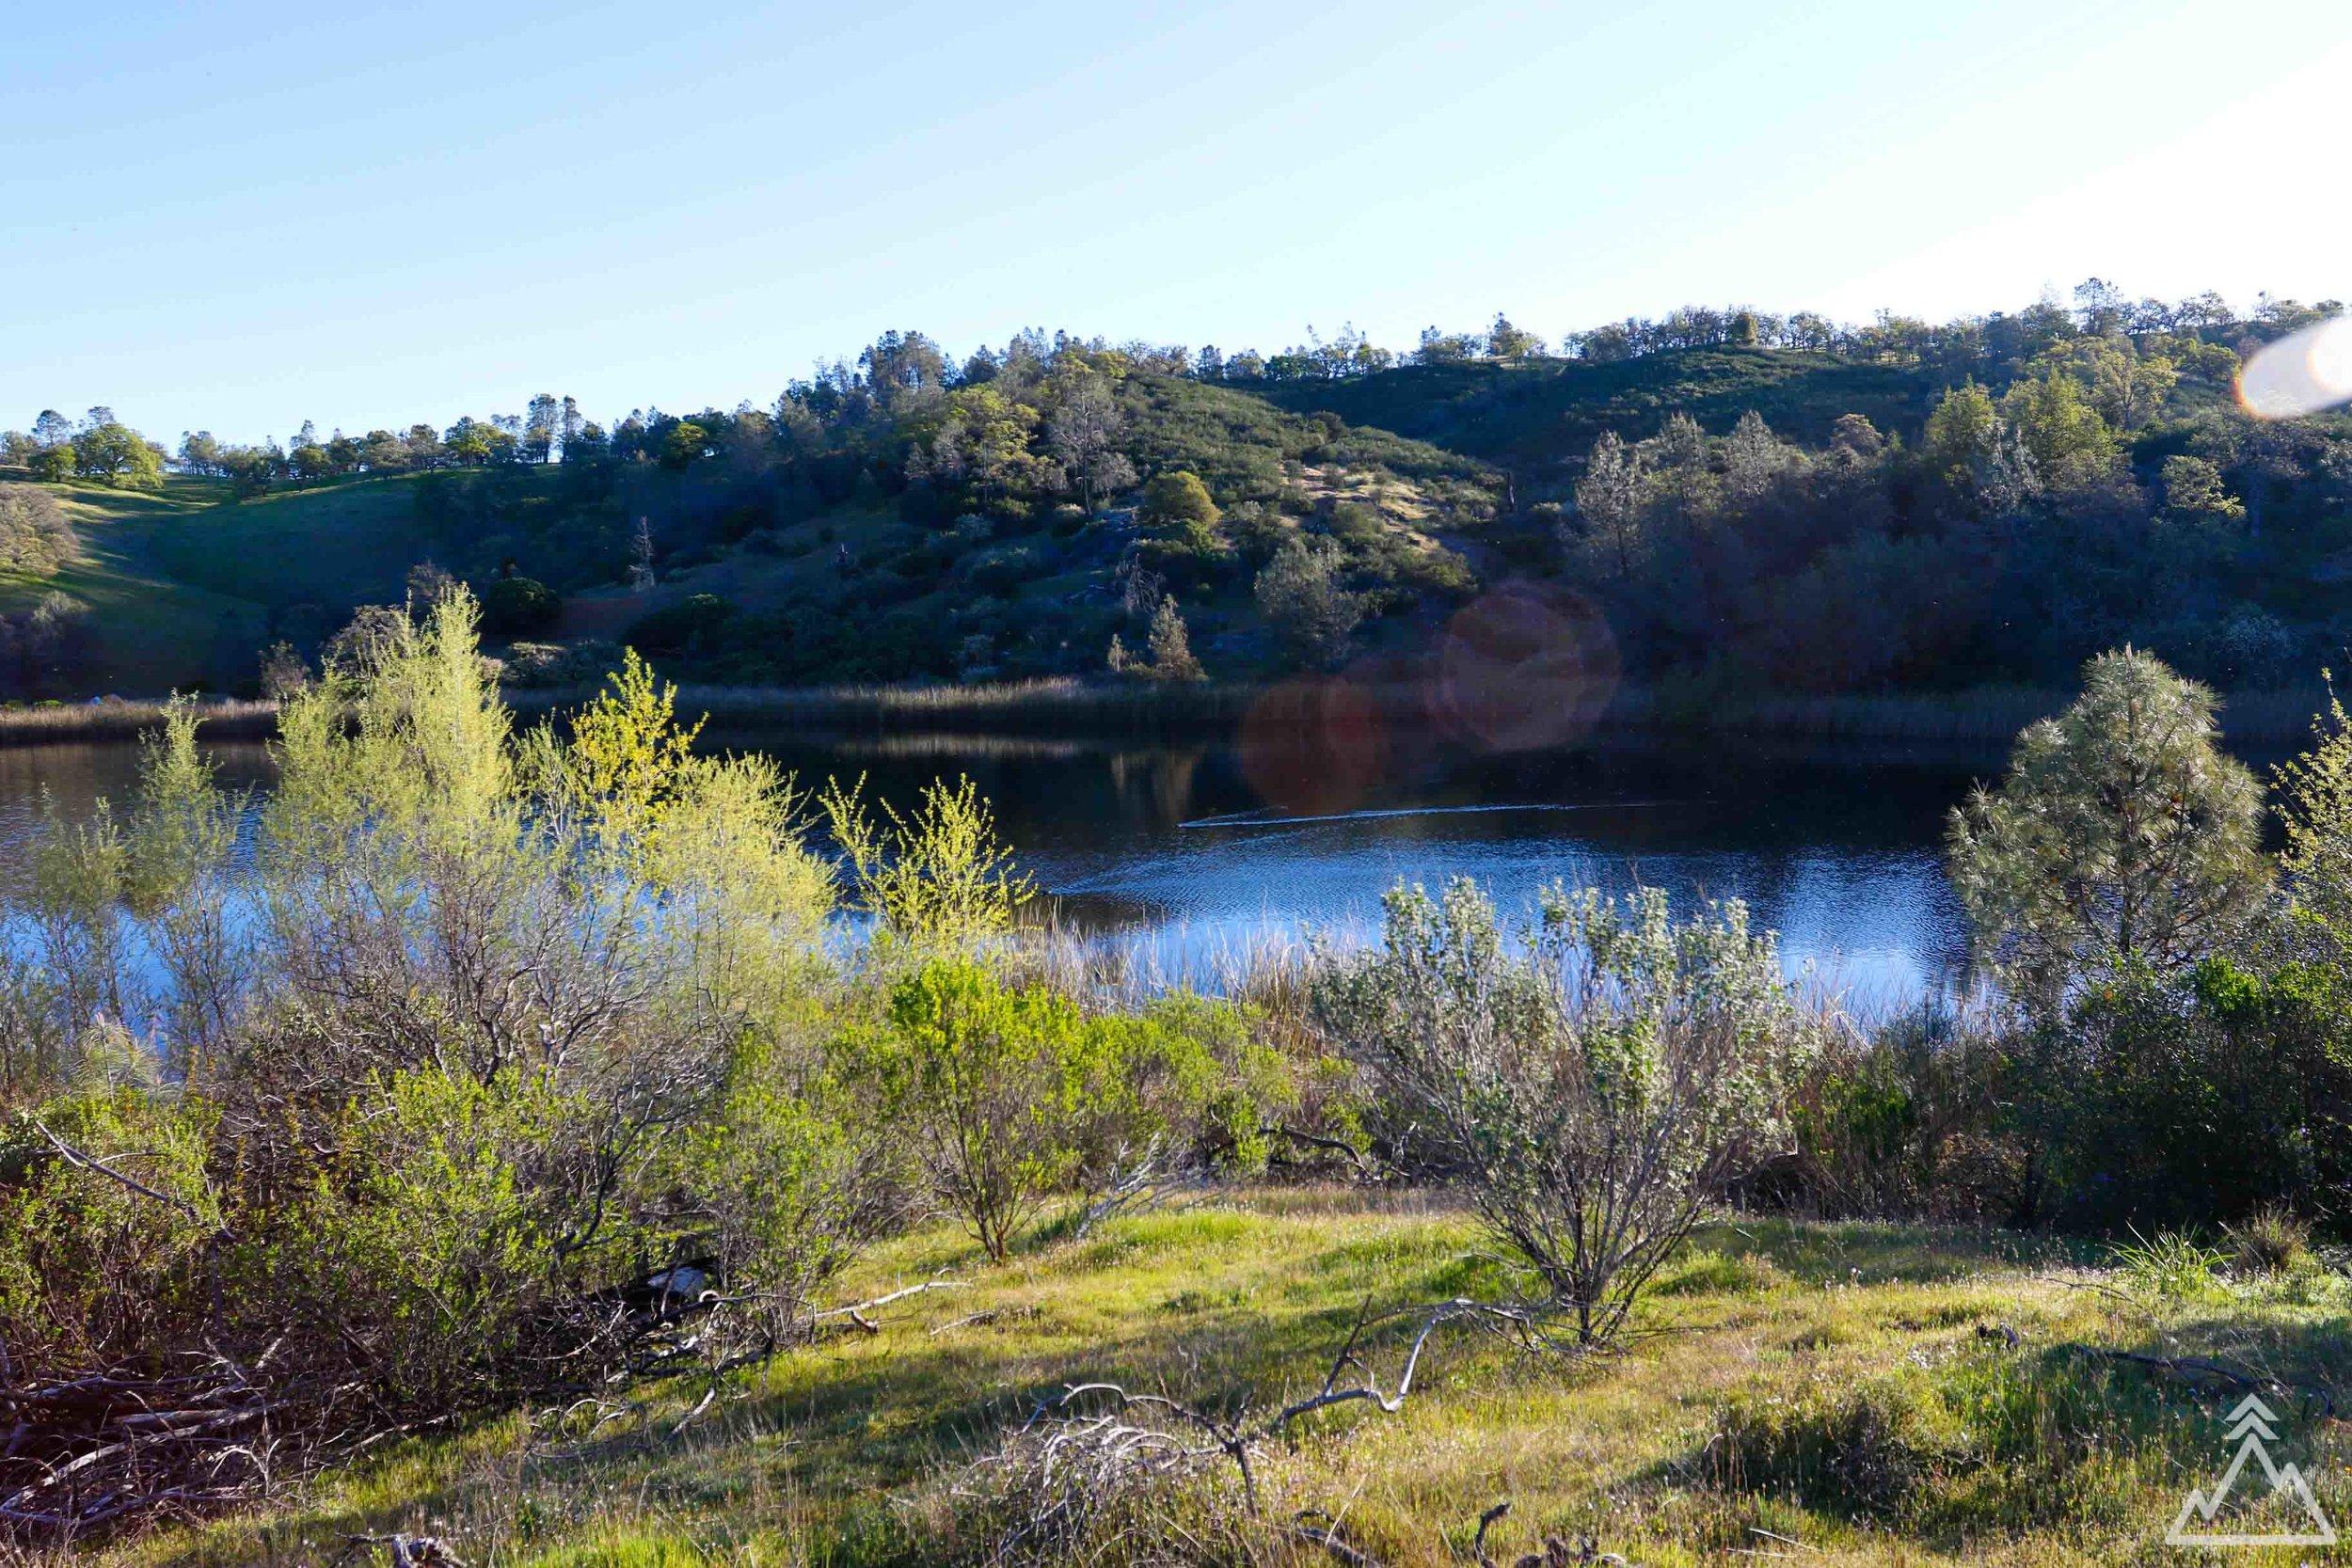 Coit Lake, Henry W. Coe